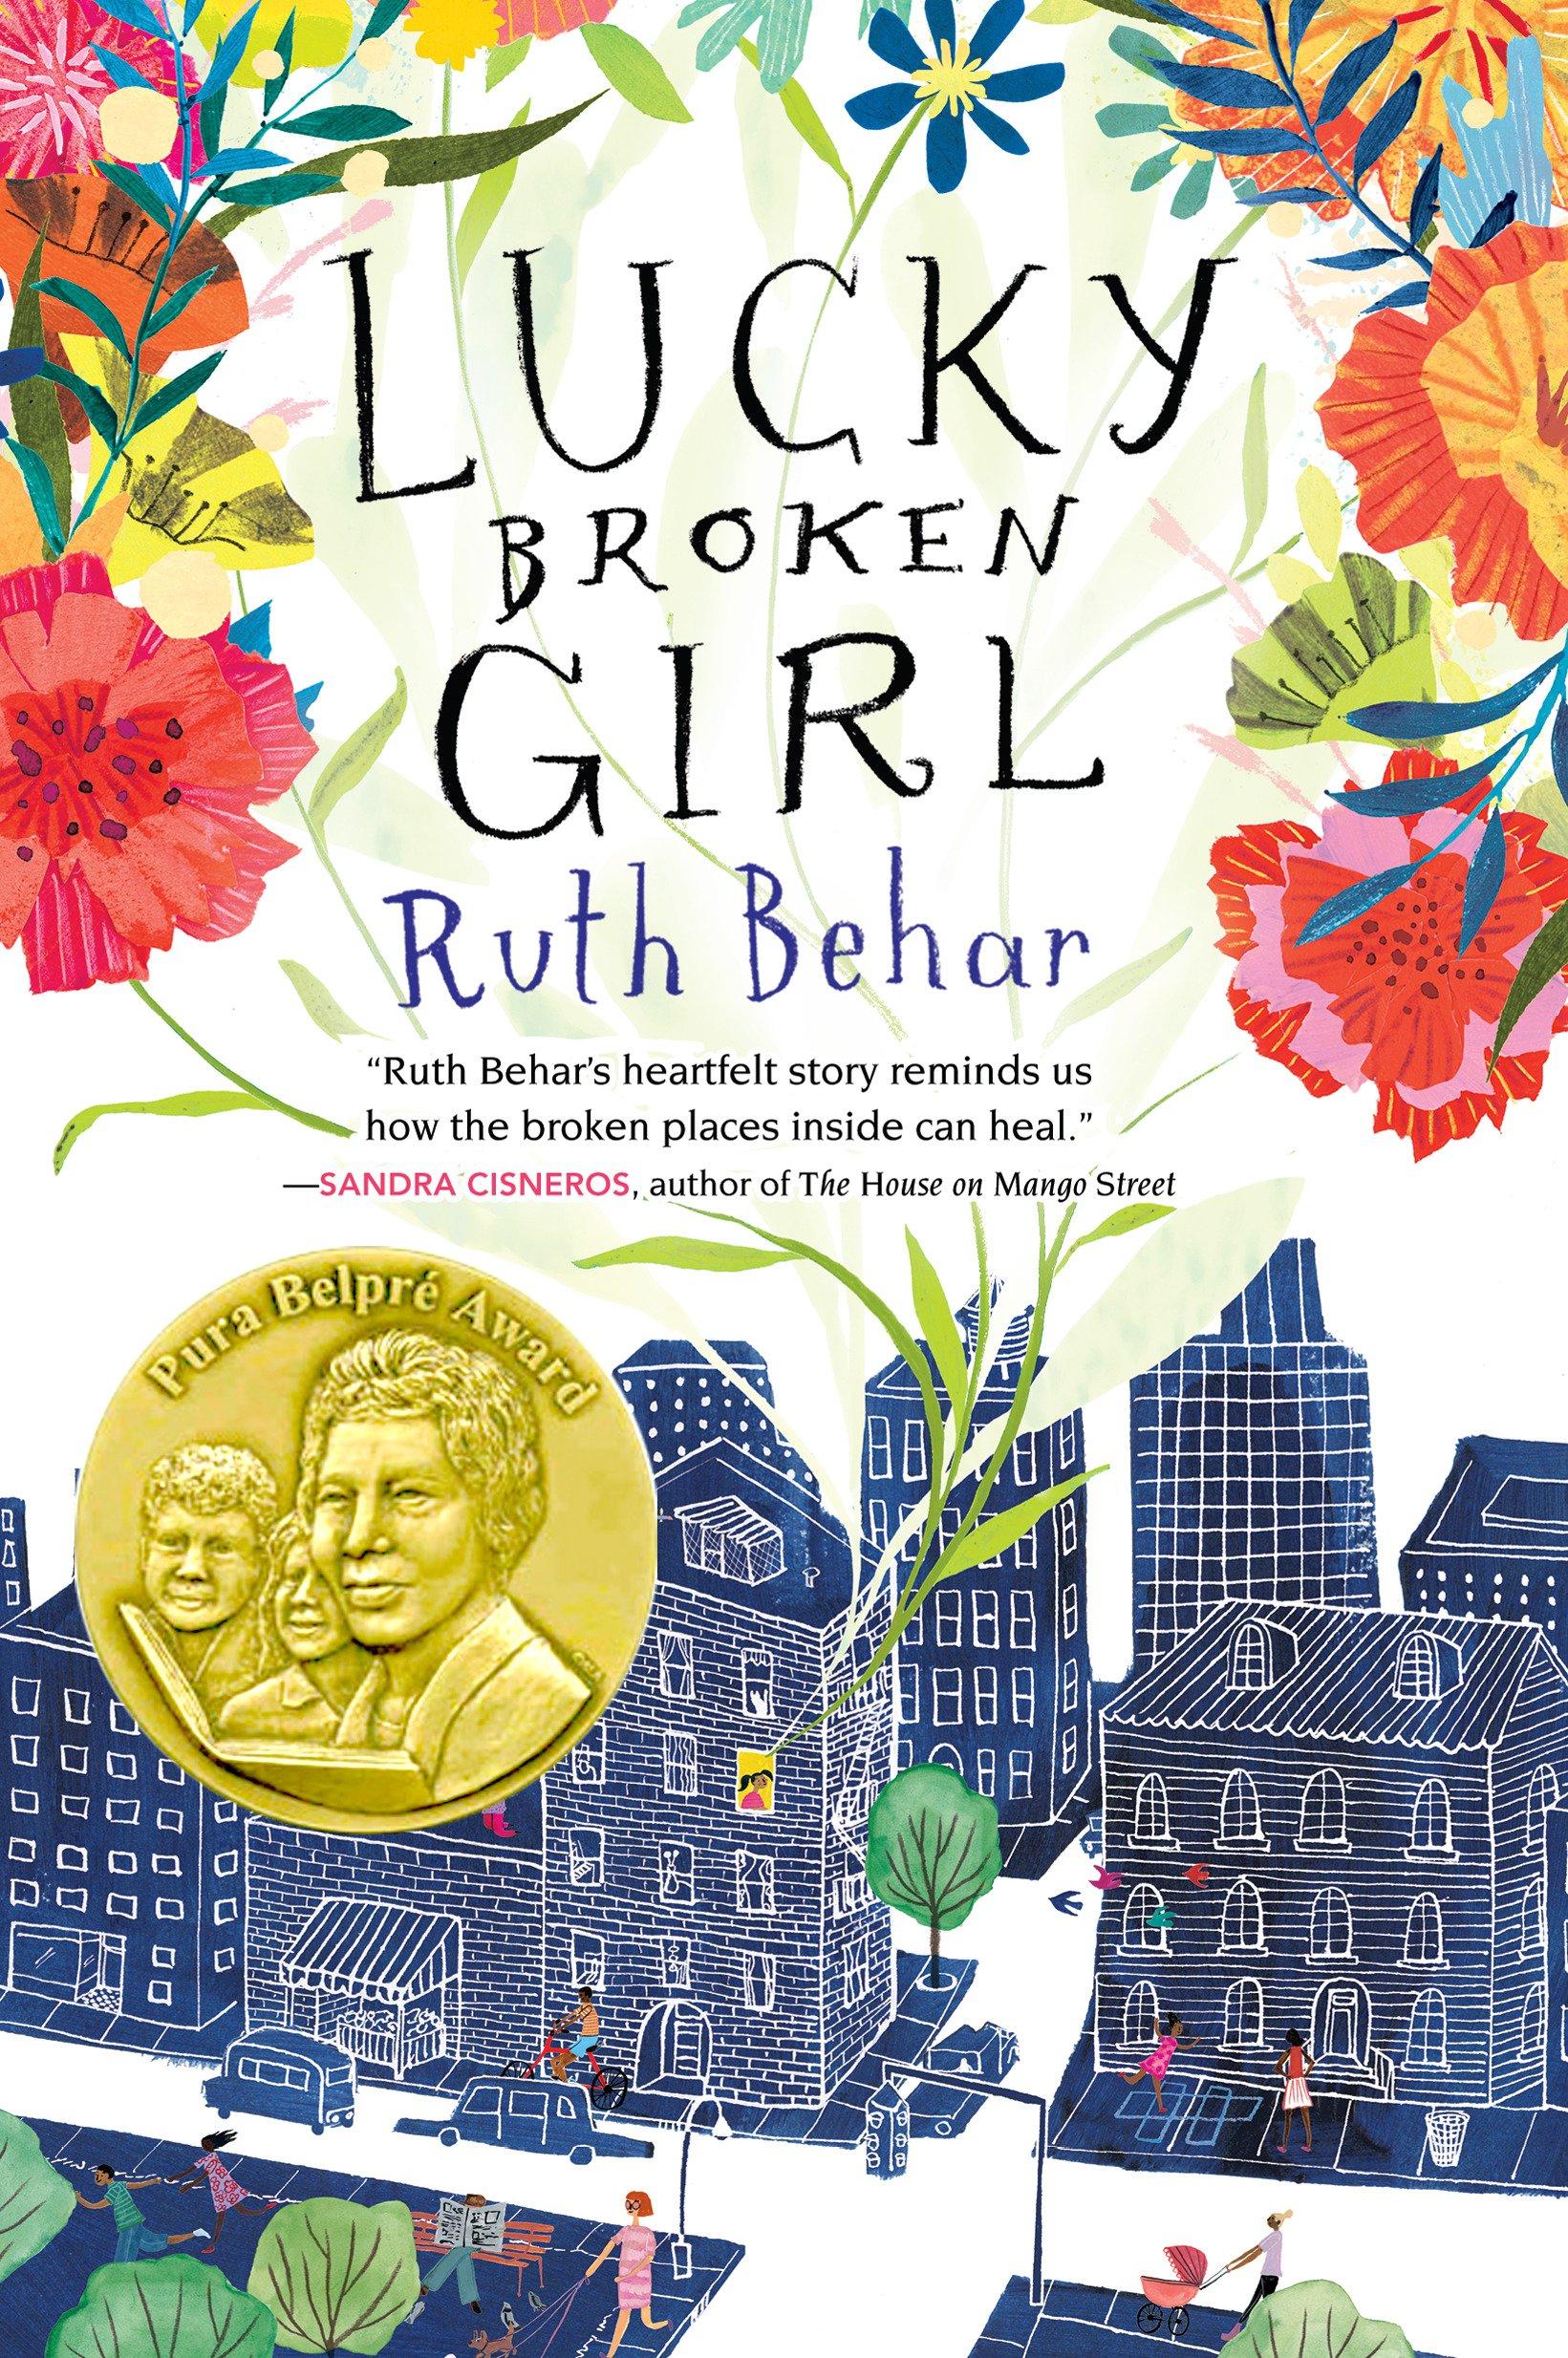 LuckyBrokenGirl full cover-front Pura Belpré Award (2) copy